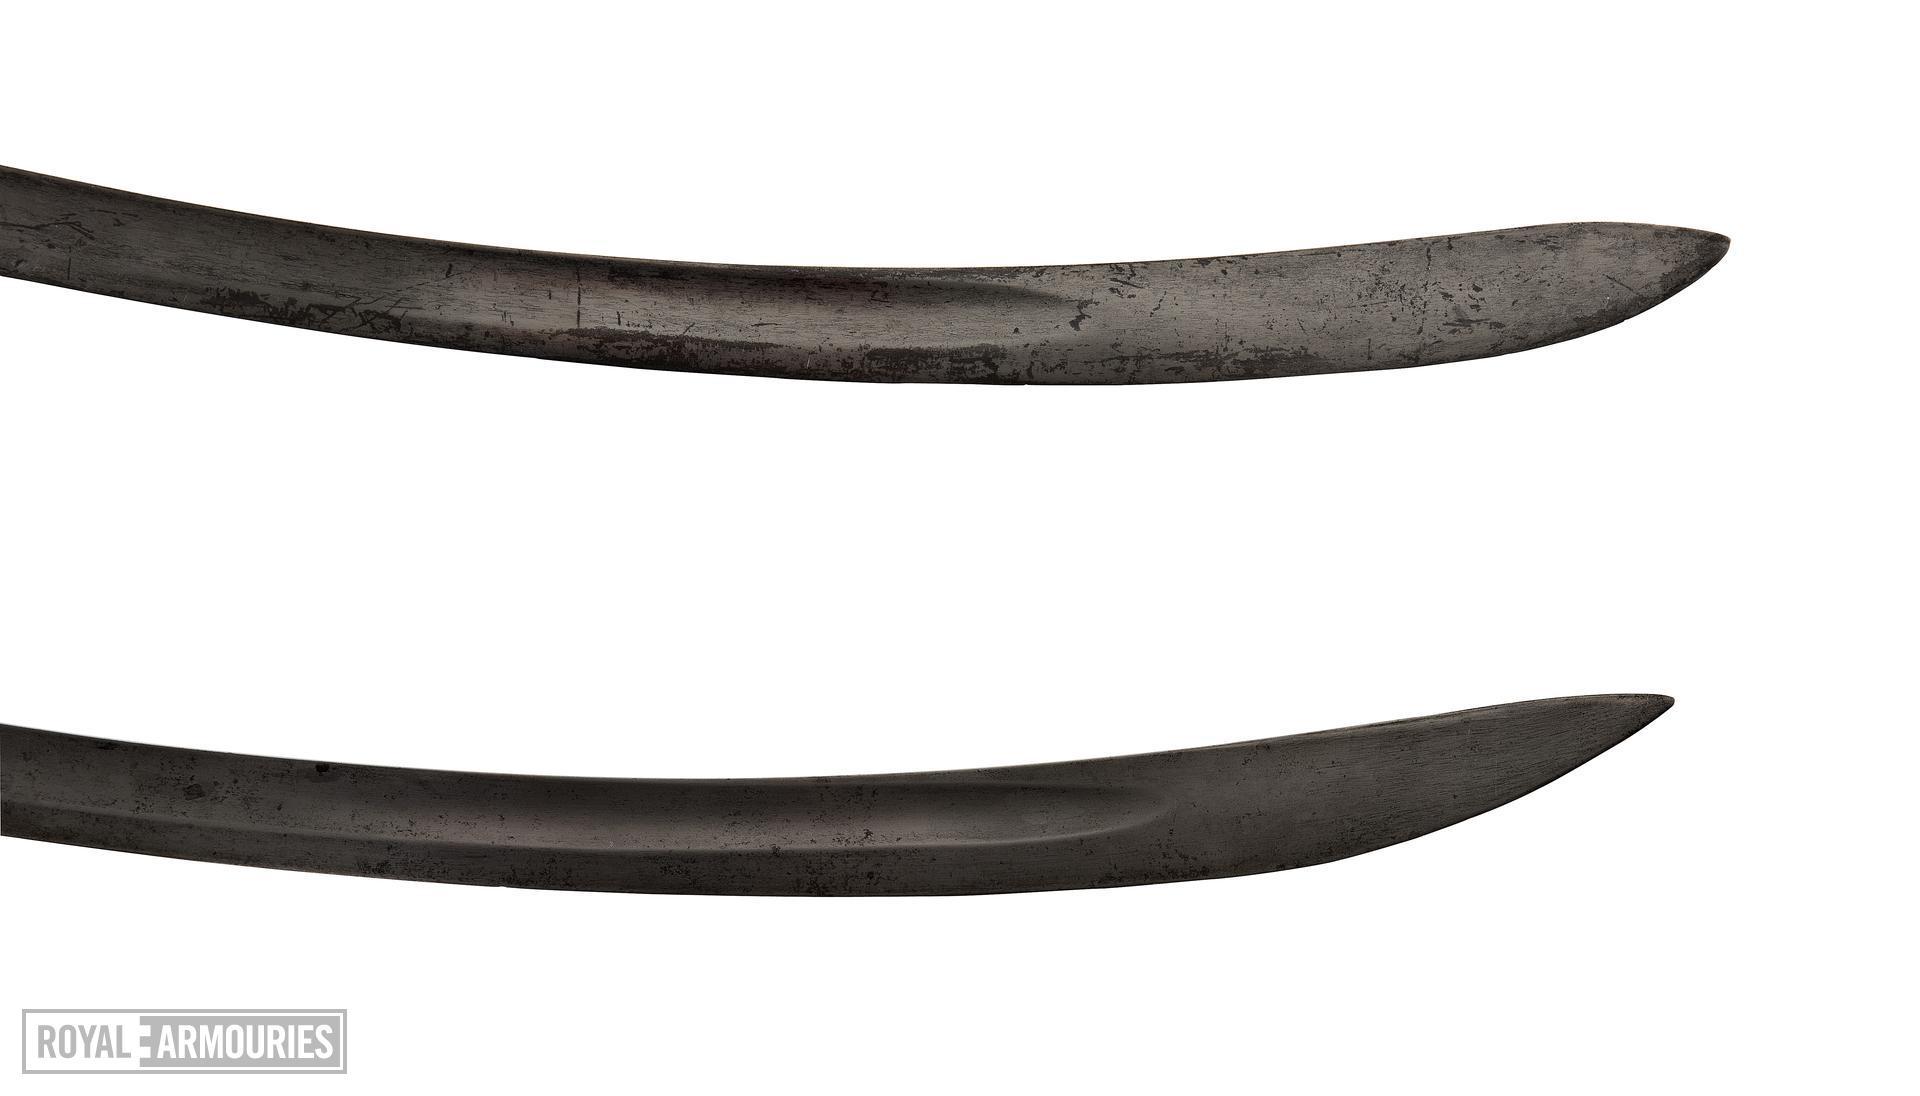 Light Cavalry sword, Pattern 1796, Britain, 1796-1821 (top) (IX.8104) and light cavalry trooper's sword. Pattern 1796, Britain, 1796-1821 (bottom) (IX.2586)